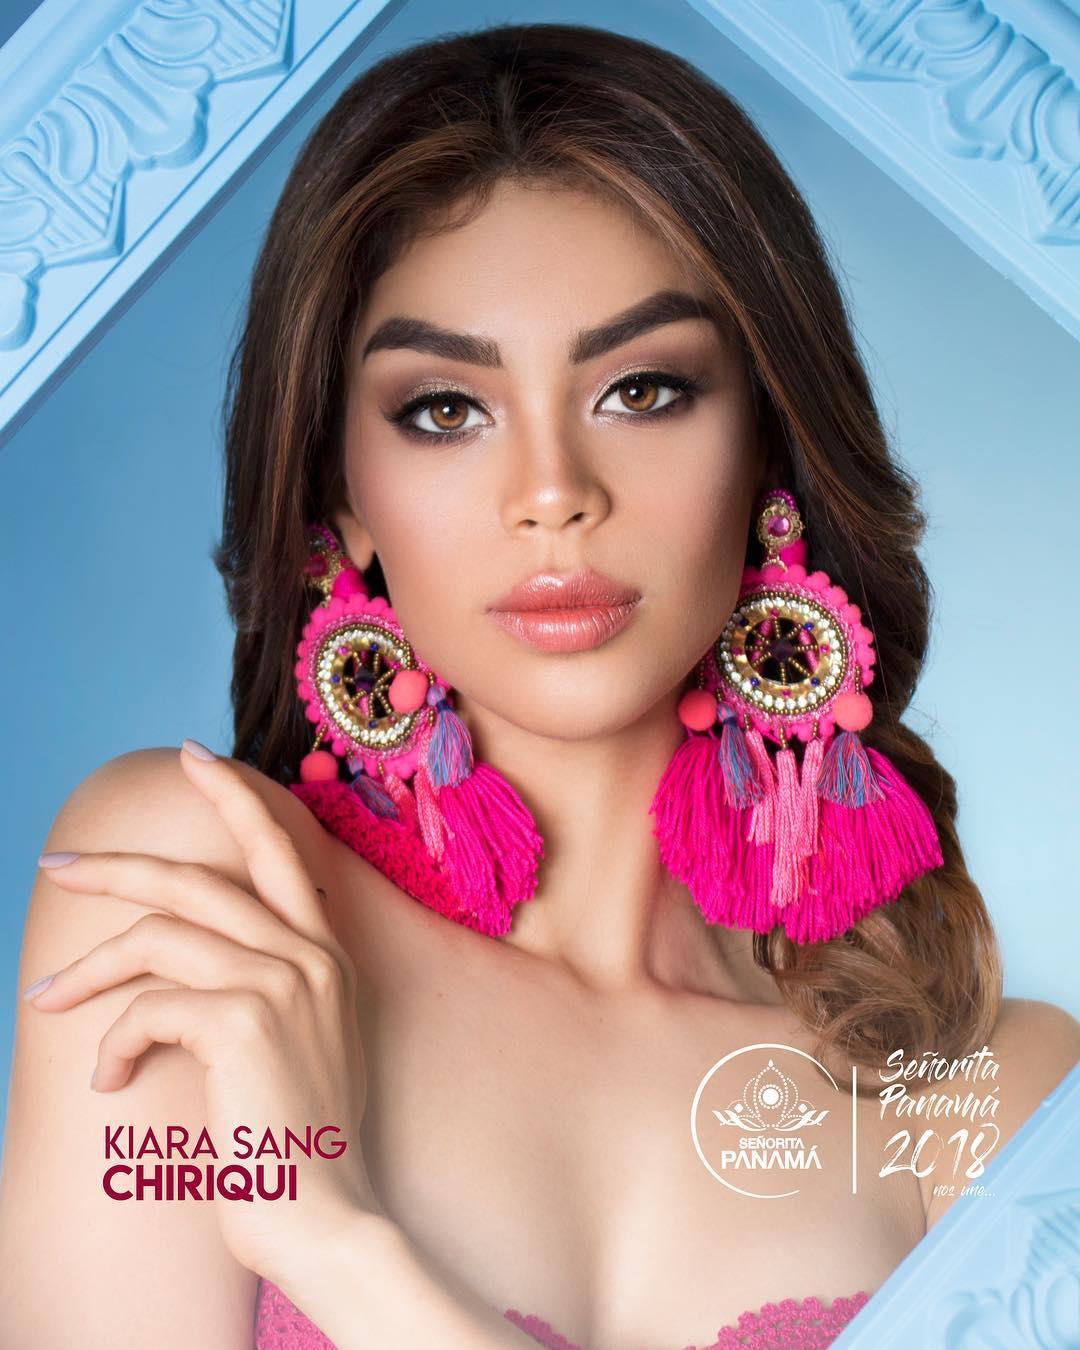 señorita miss colombia 2018 candidates candidatas contestants delegates Miss Chiriquí Kiara Sang